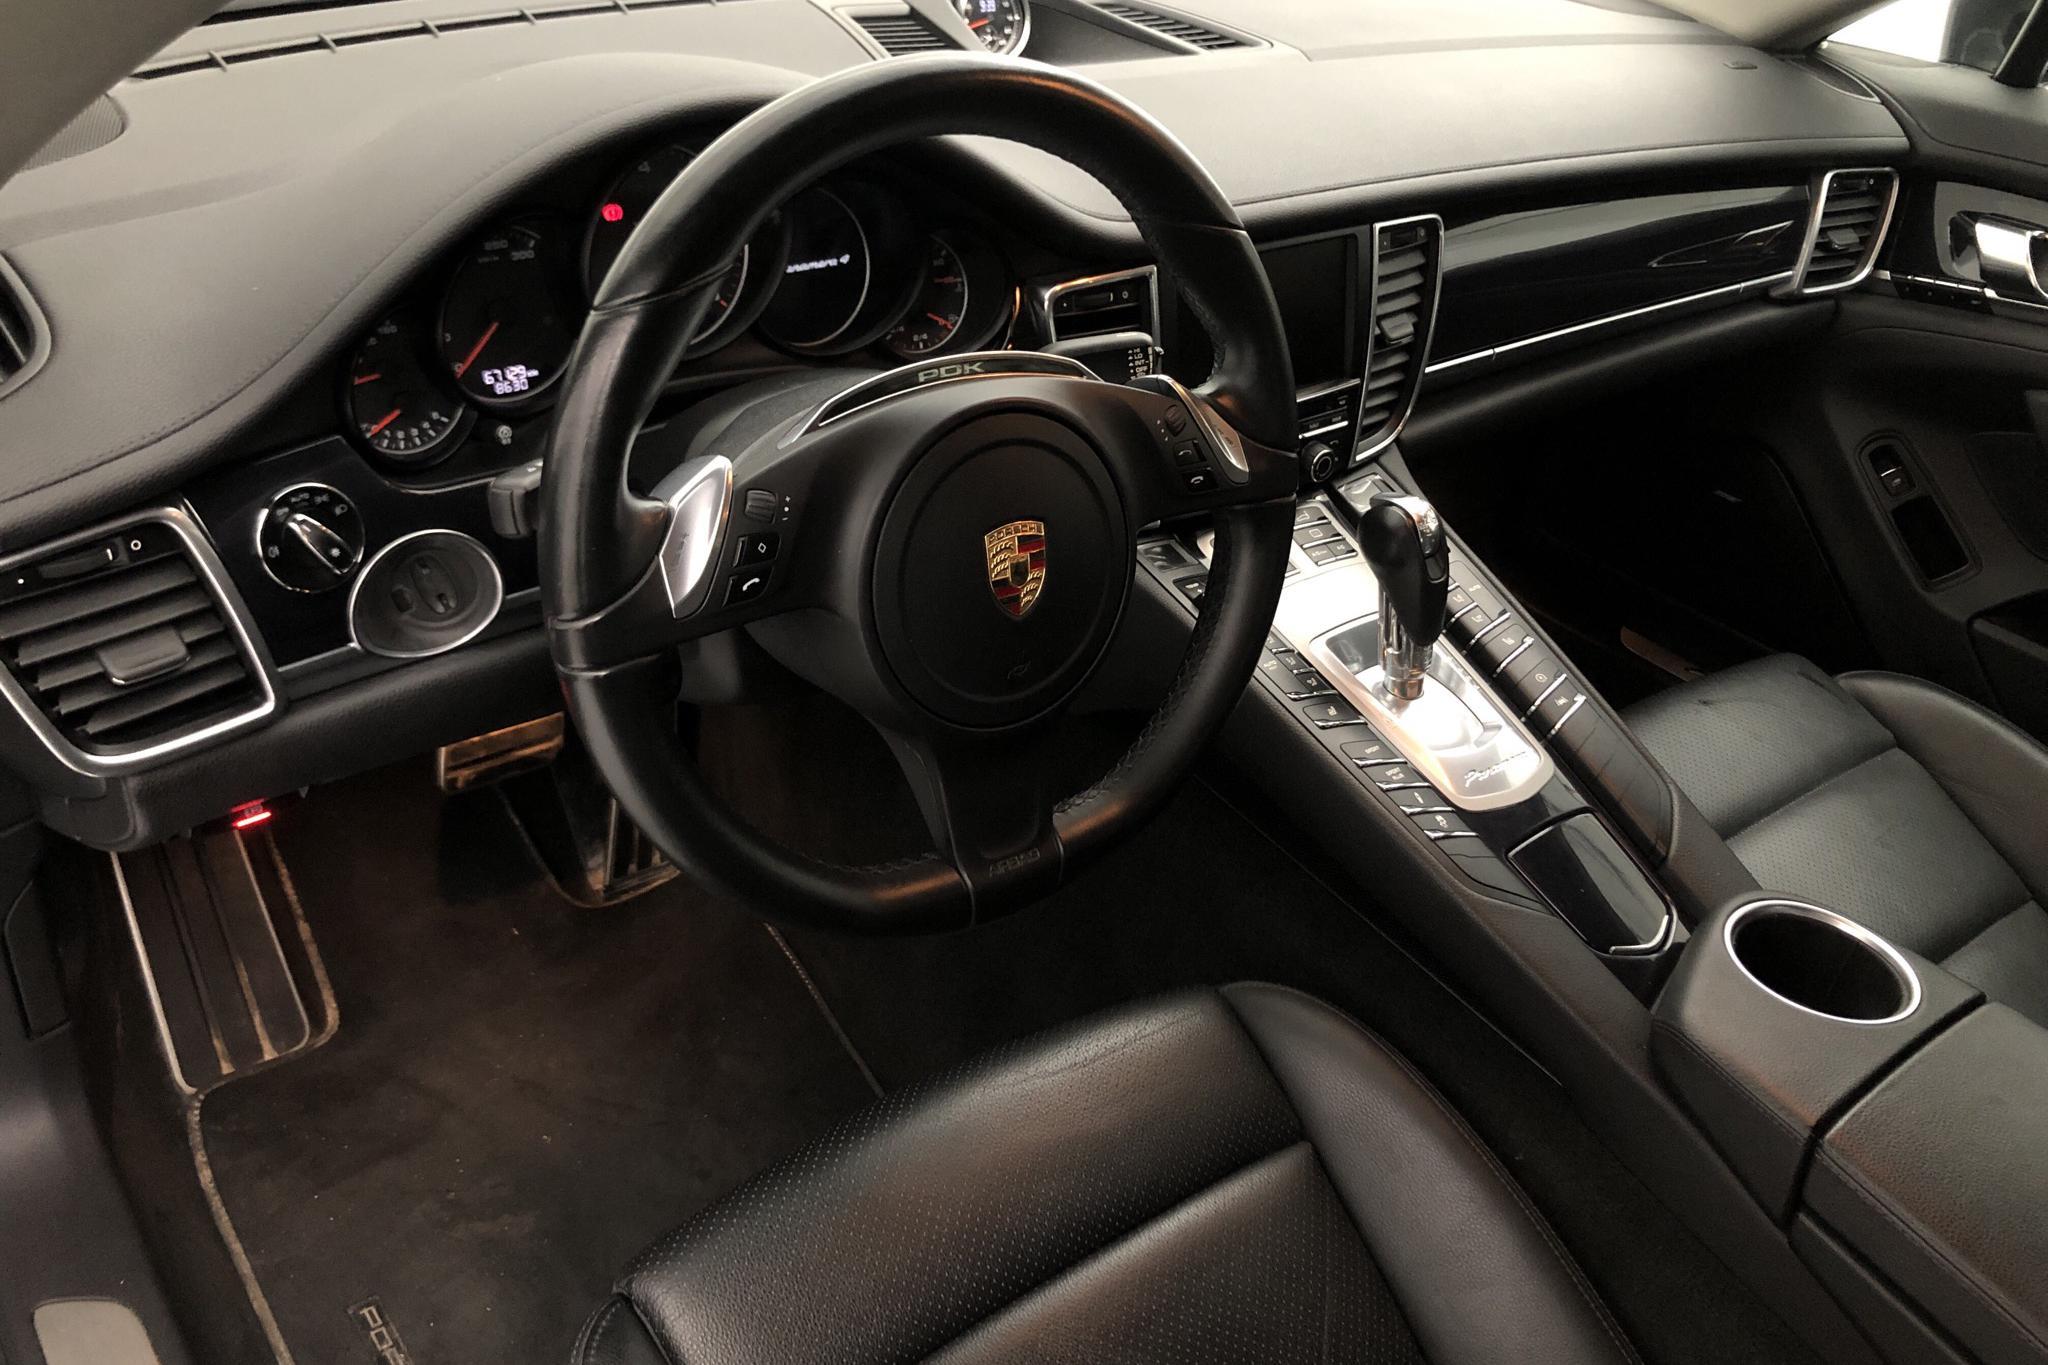 Porsche Panamera 4 (310hk) - 6 712 mil - Automat - svart - 2015